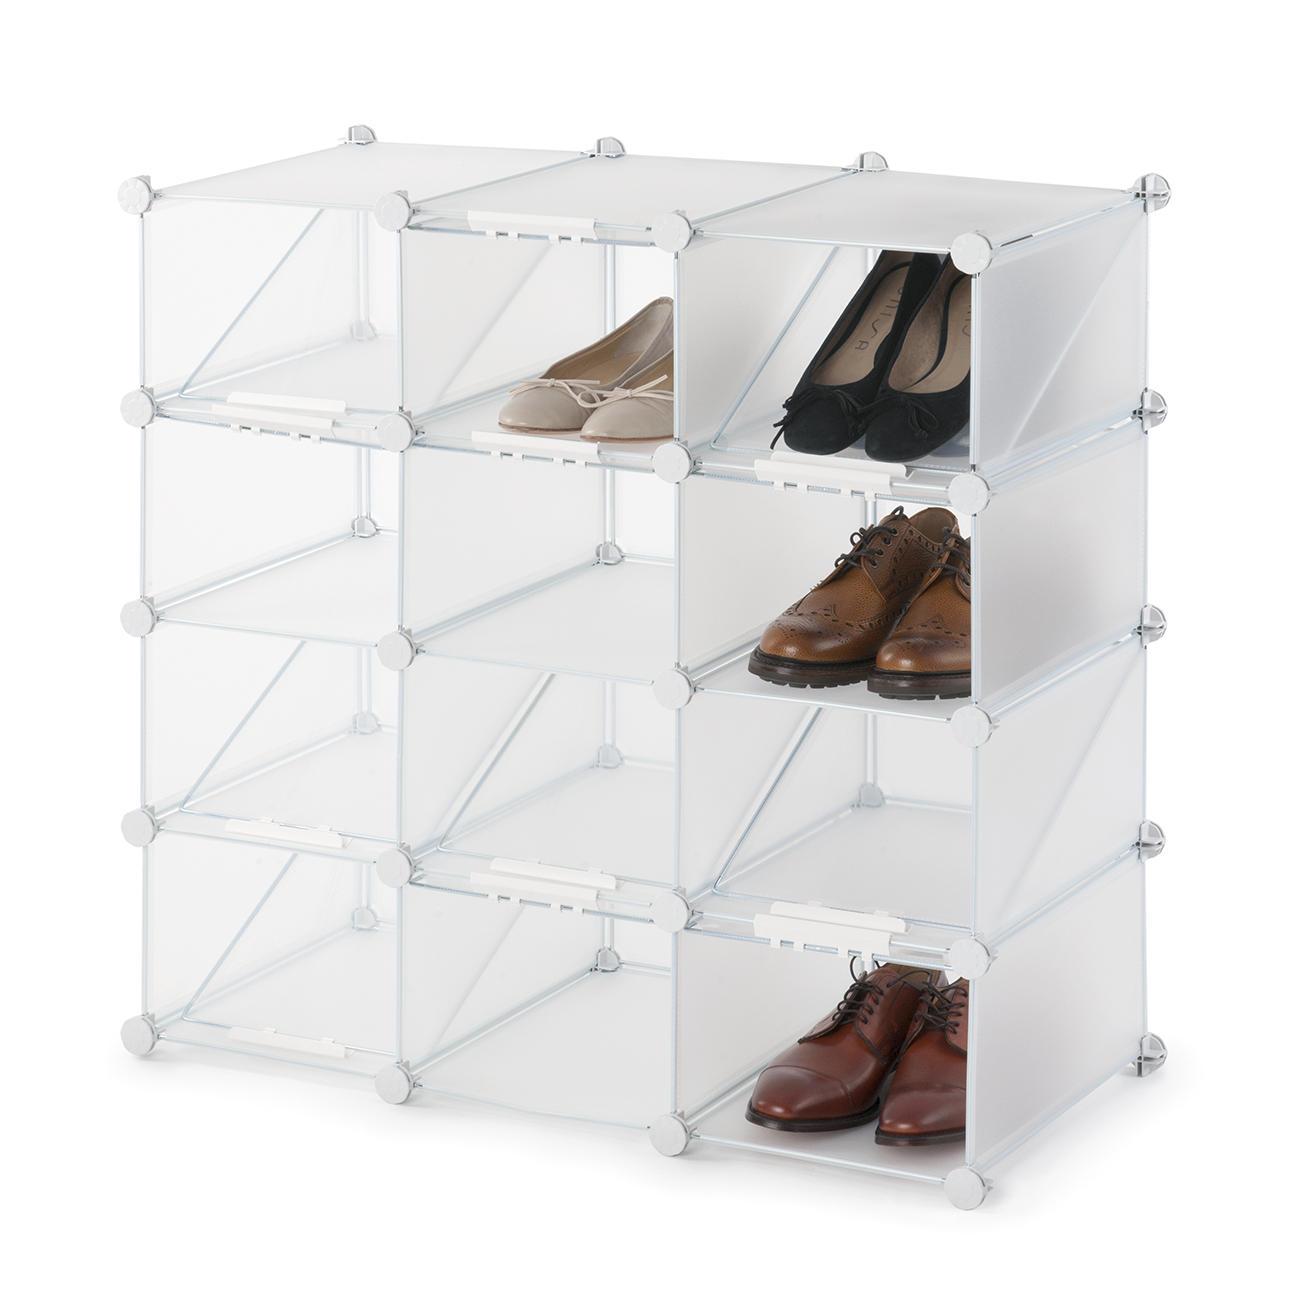 Schuhe Verstauen Neu Dsquared2 Zip Up Boots Stiefel Herren Echtleder